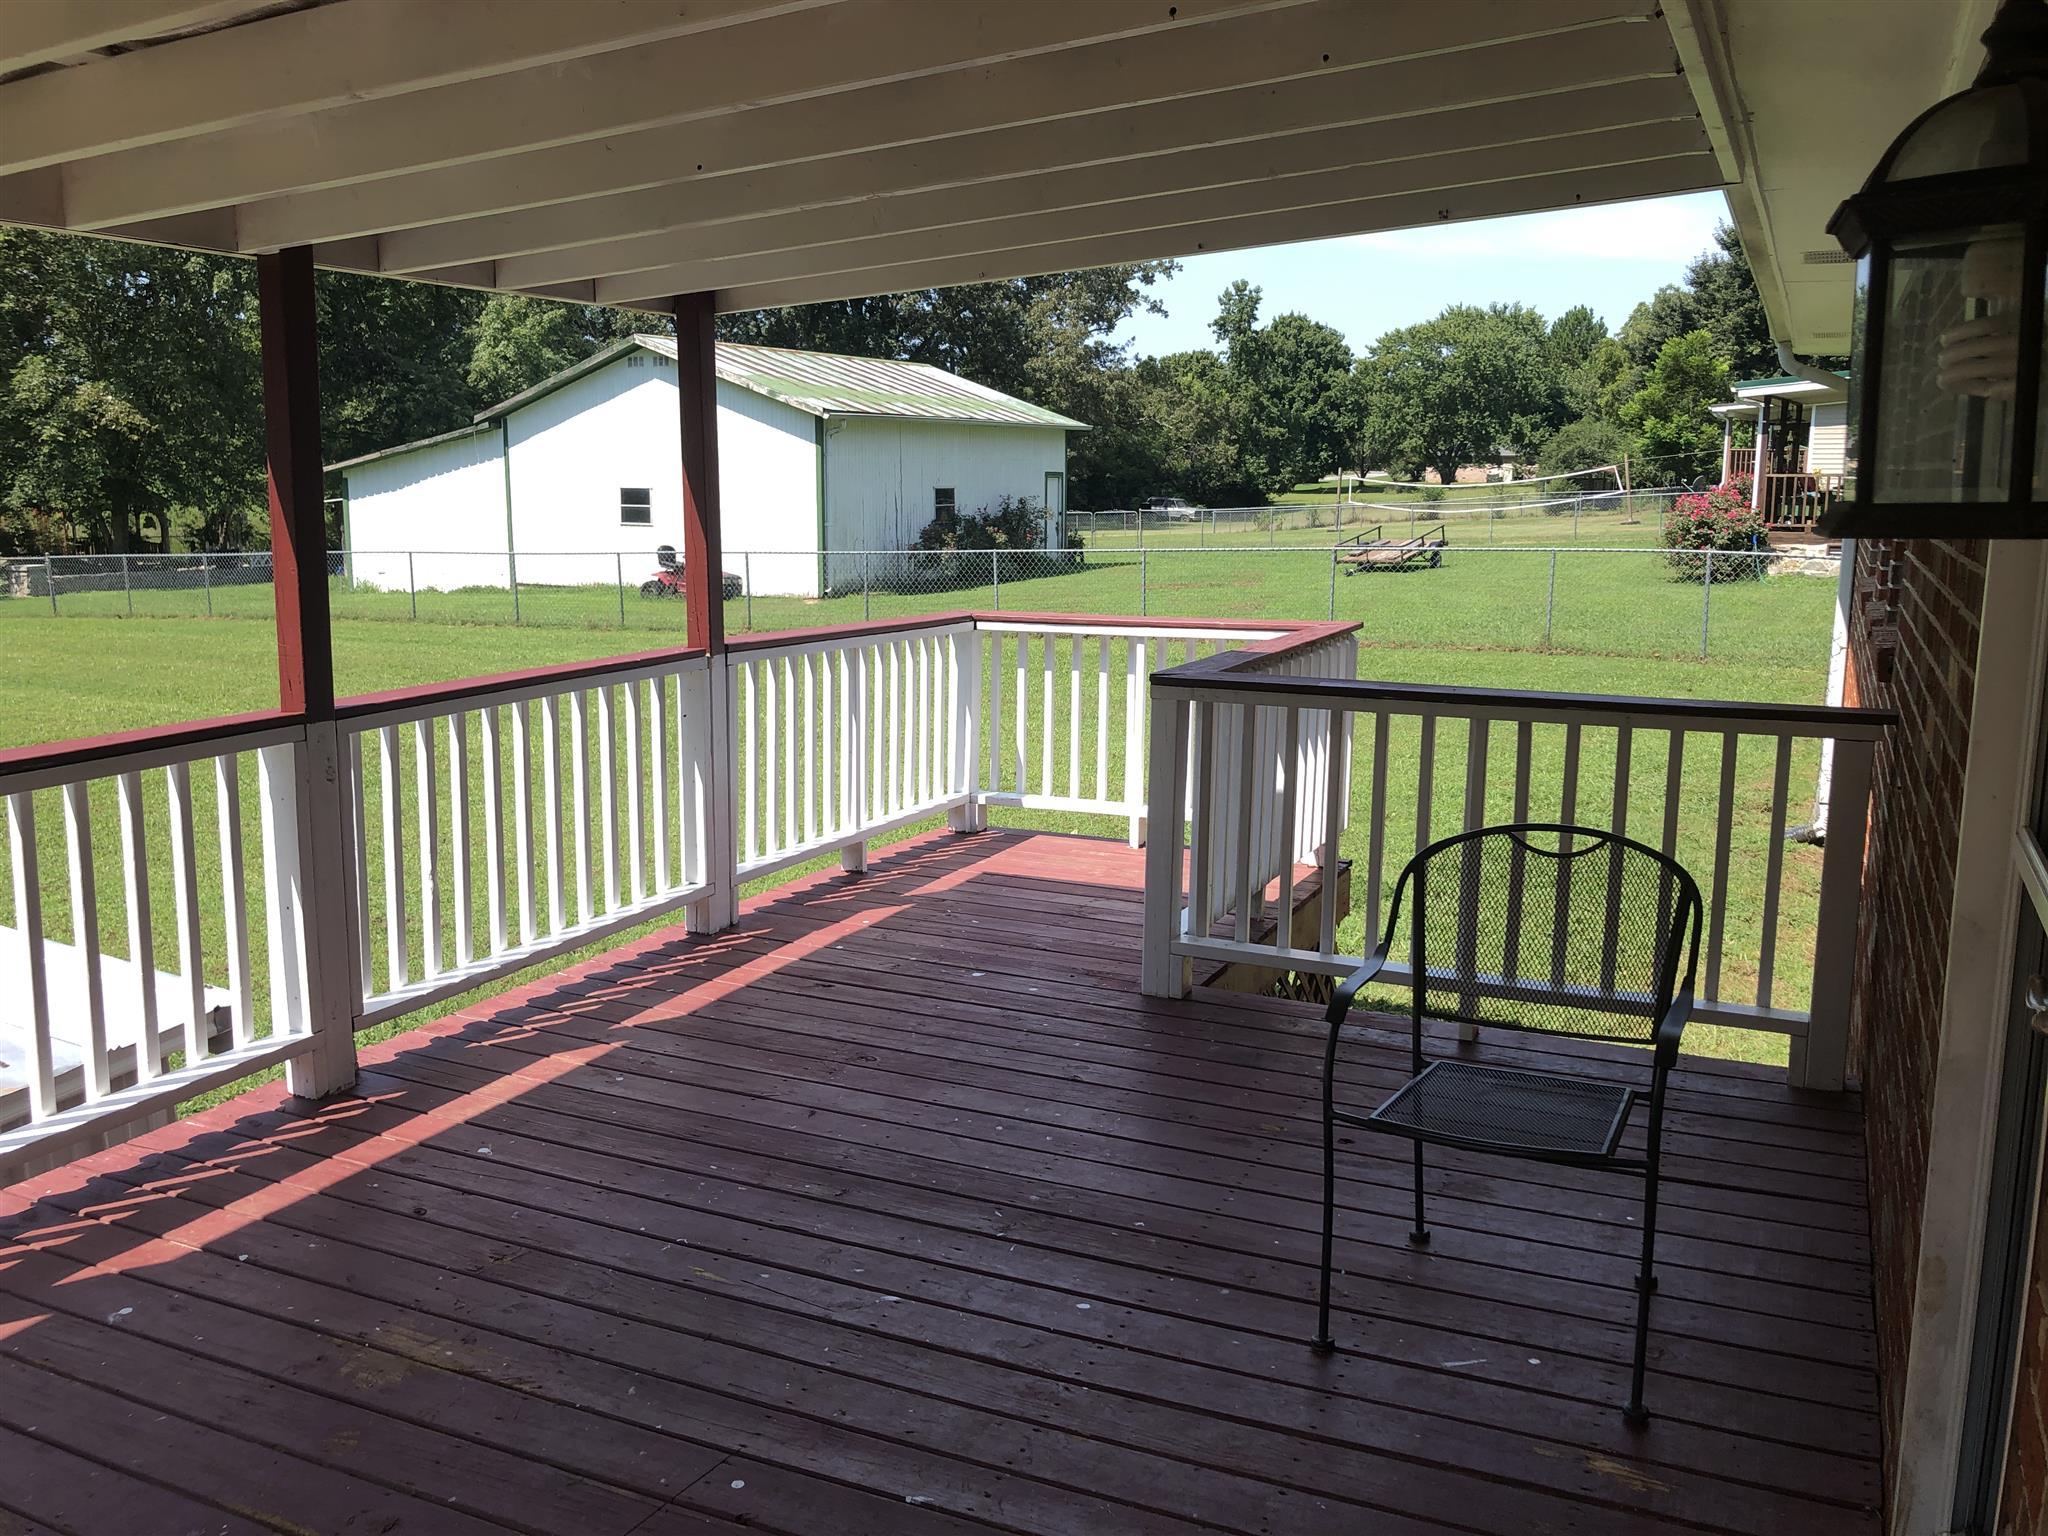 13 Eastwood Dr, Fayetteville, TN 37334 - Fayetteville, TN real estate listing